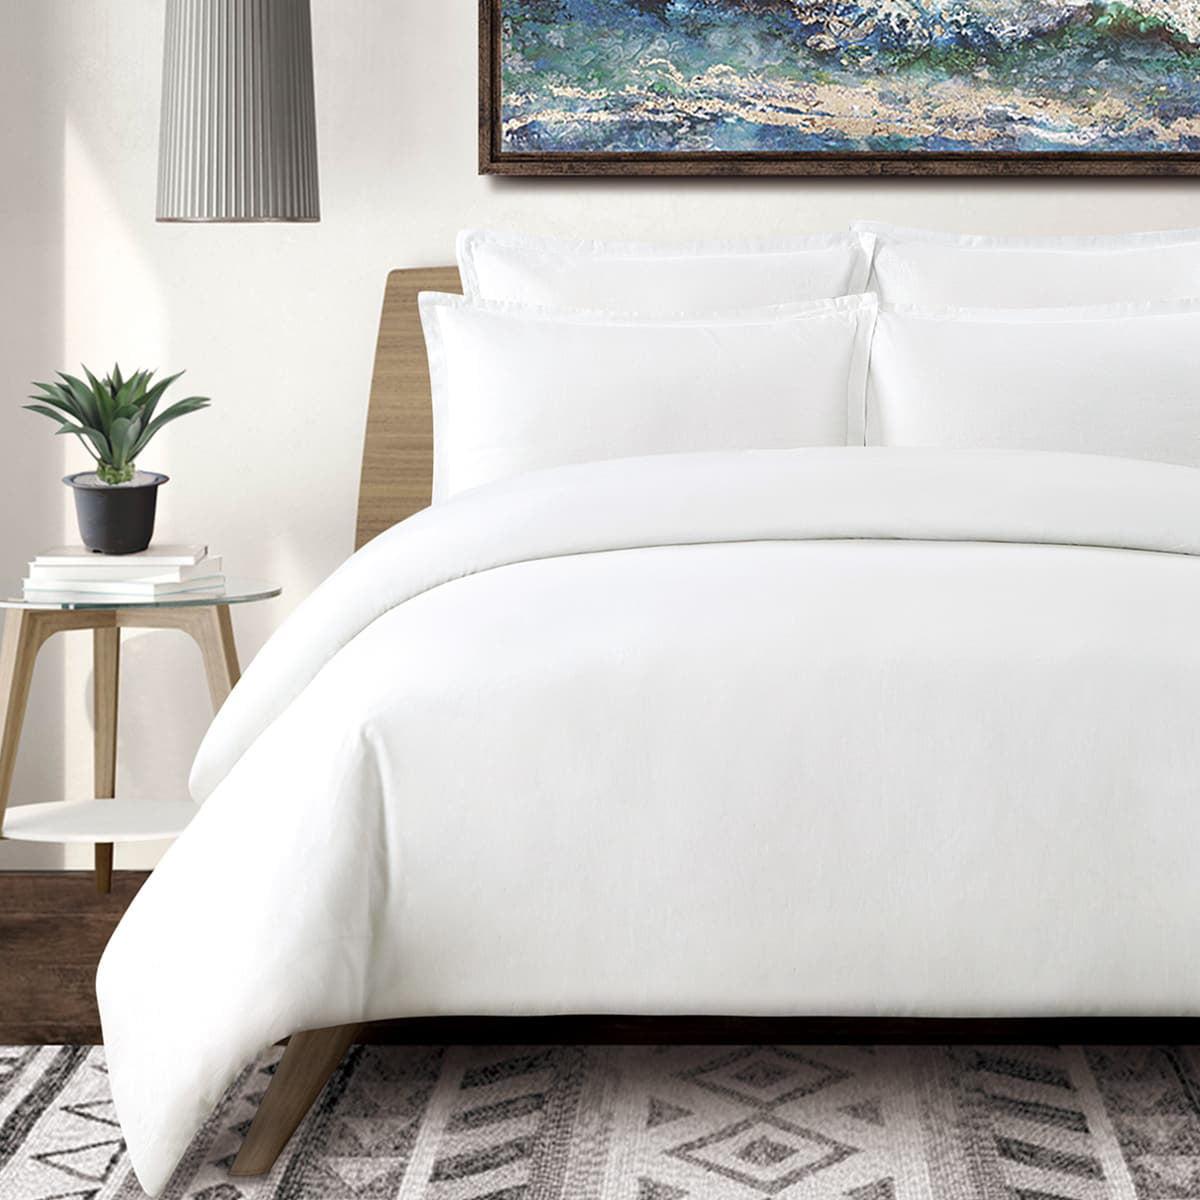 Echelon Home Washed Linen Cotton Blend Duvet Cover Set Walmart Com Walmart Com